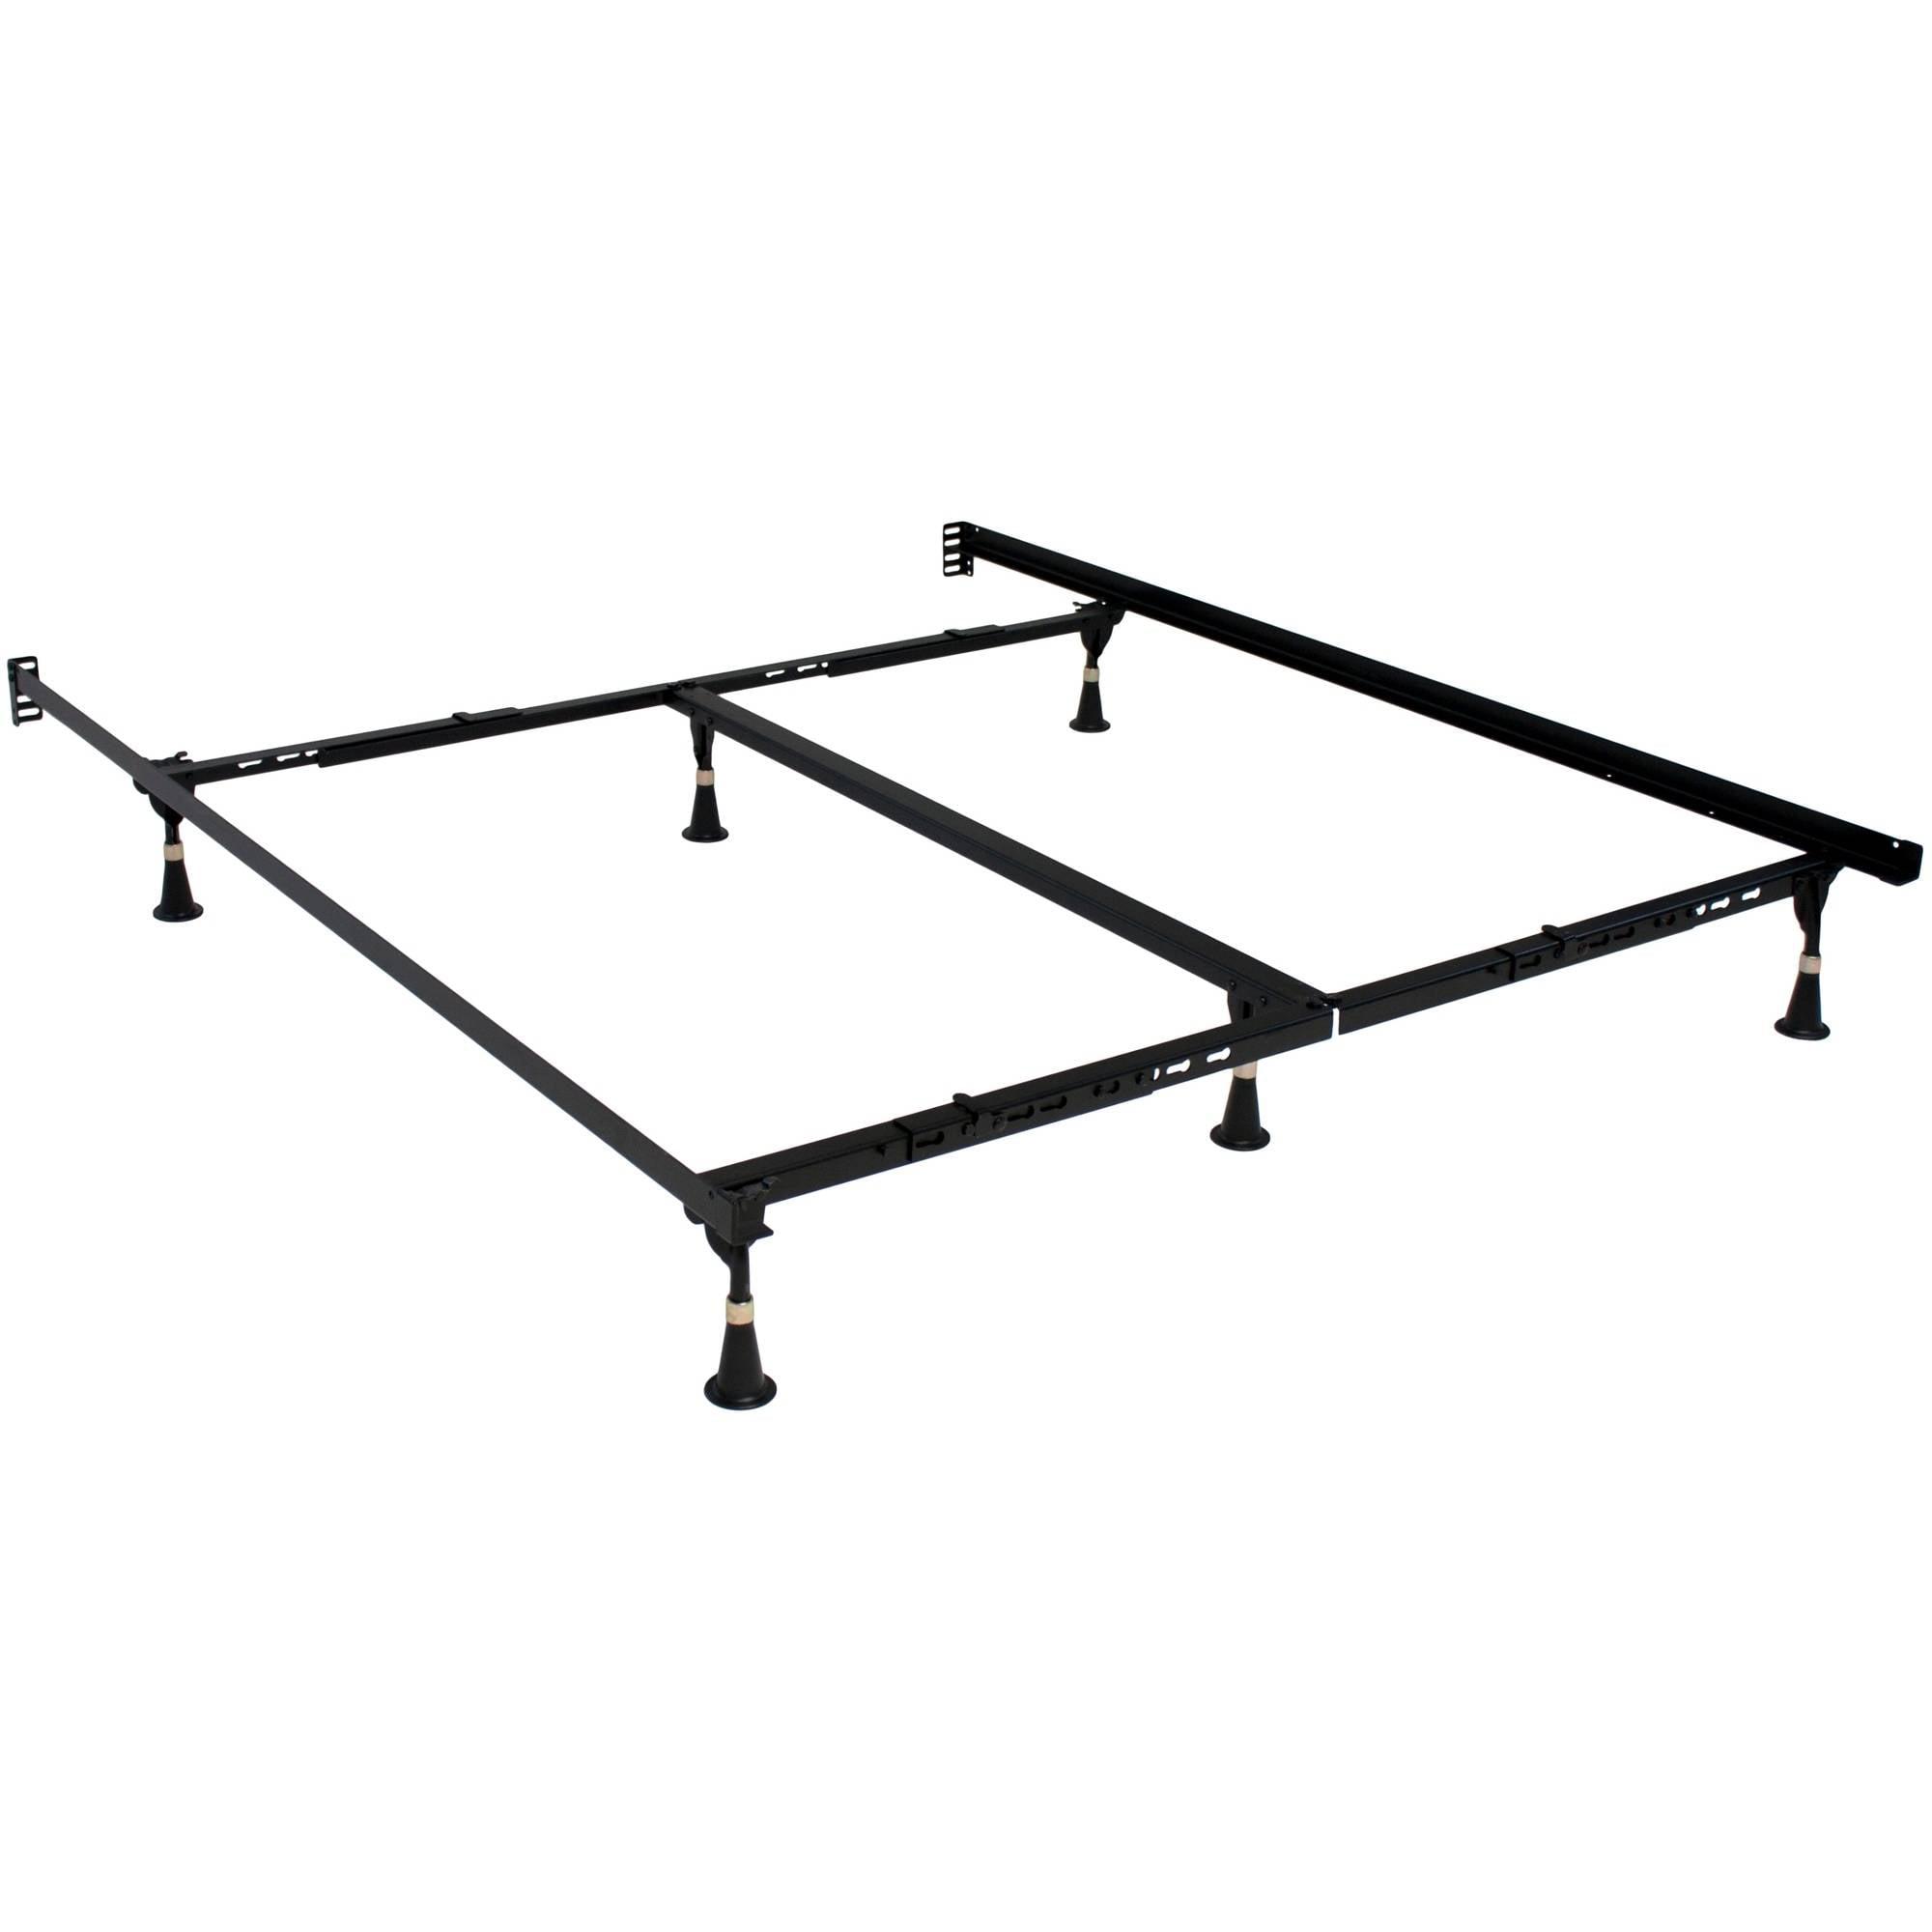 Beautyrest Premium Adjustable Bed Frame, Brown by Hollywood Bed & Spring